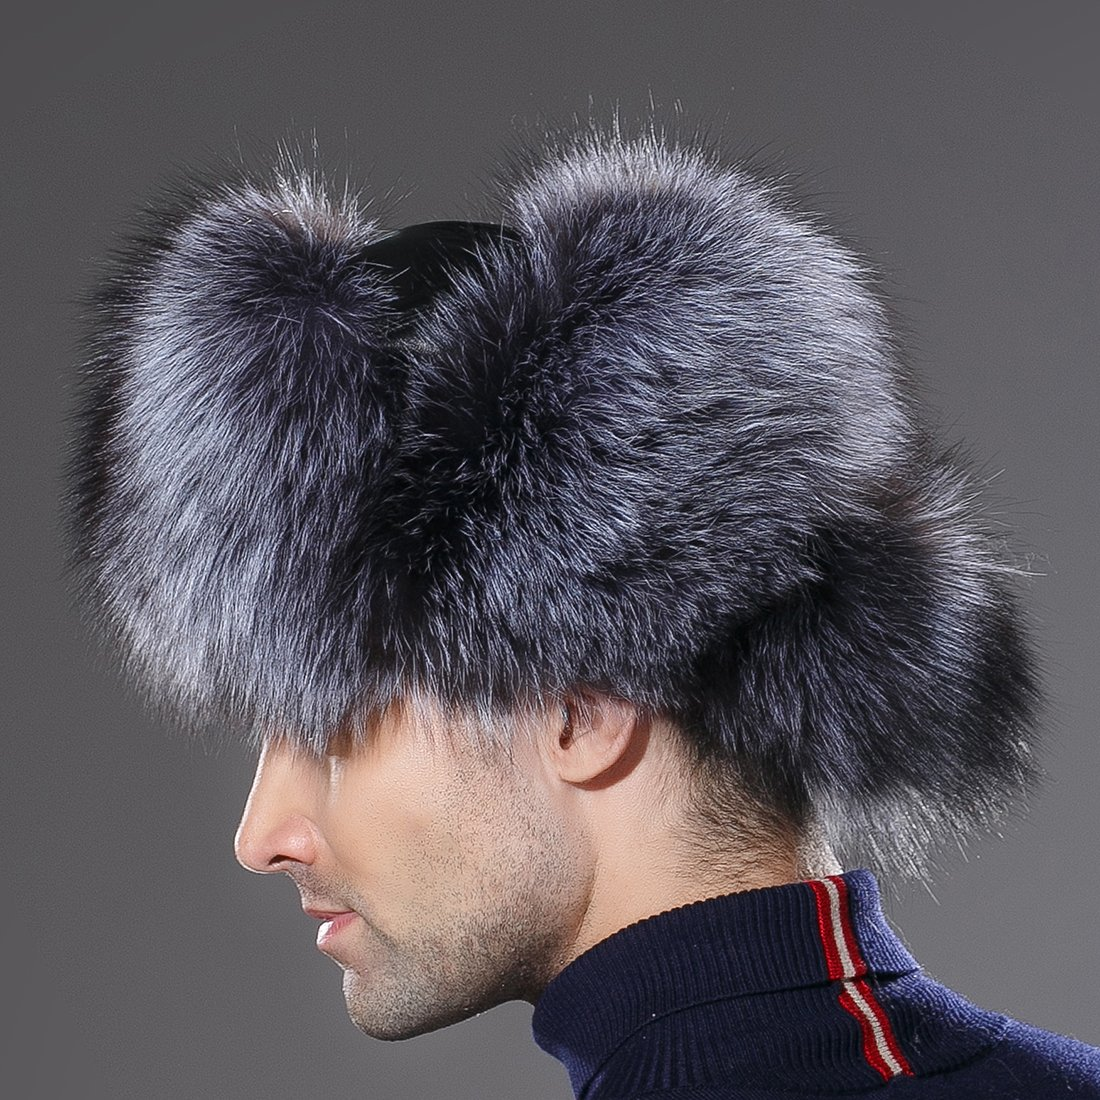 URSFUR Winter Mens Russian Ushanka Hat Real Leather & Silver Fox Fur Trapper Cap by URSFUR (Image #6)